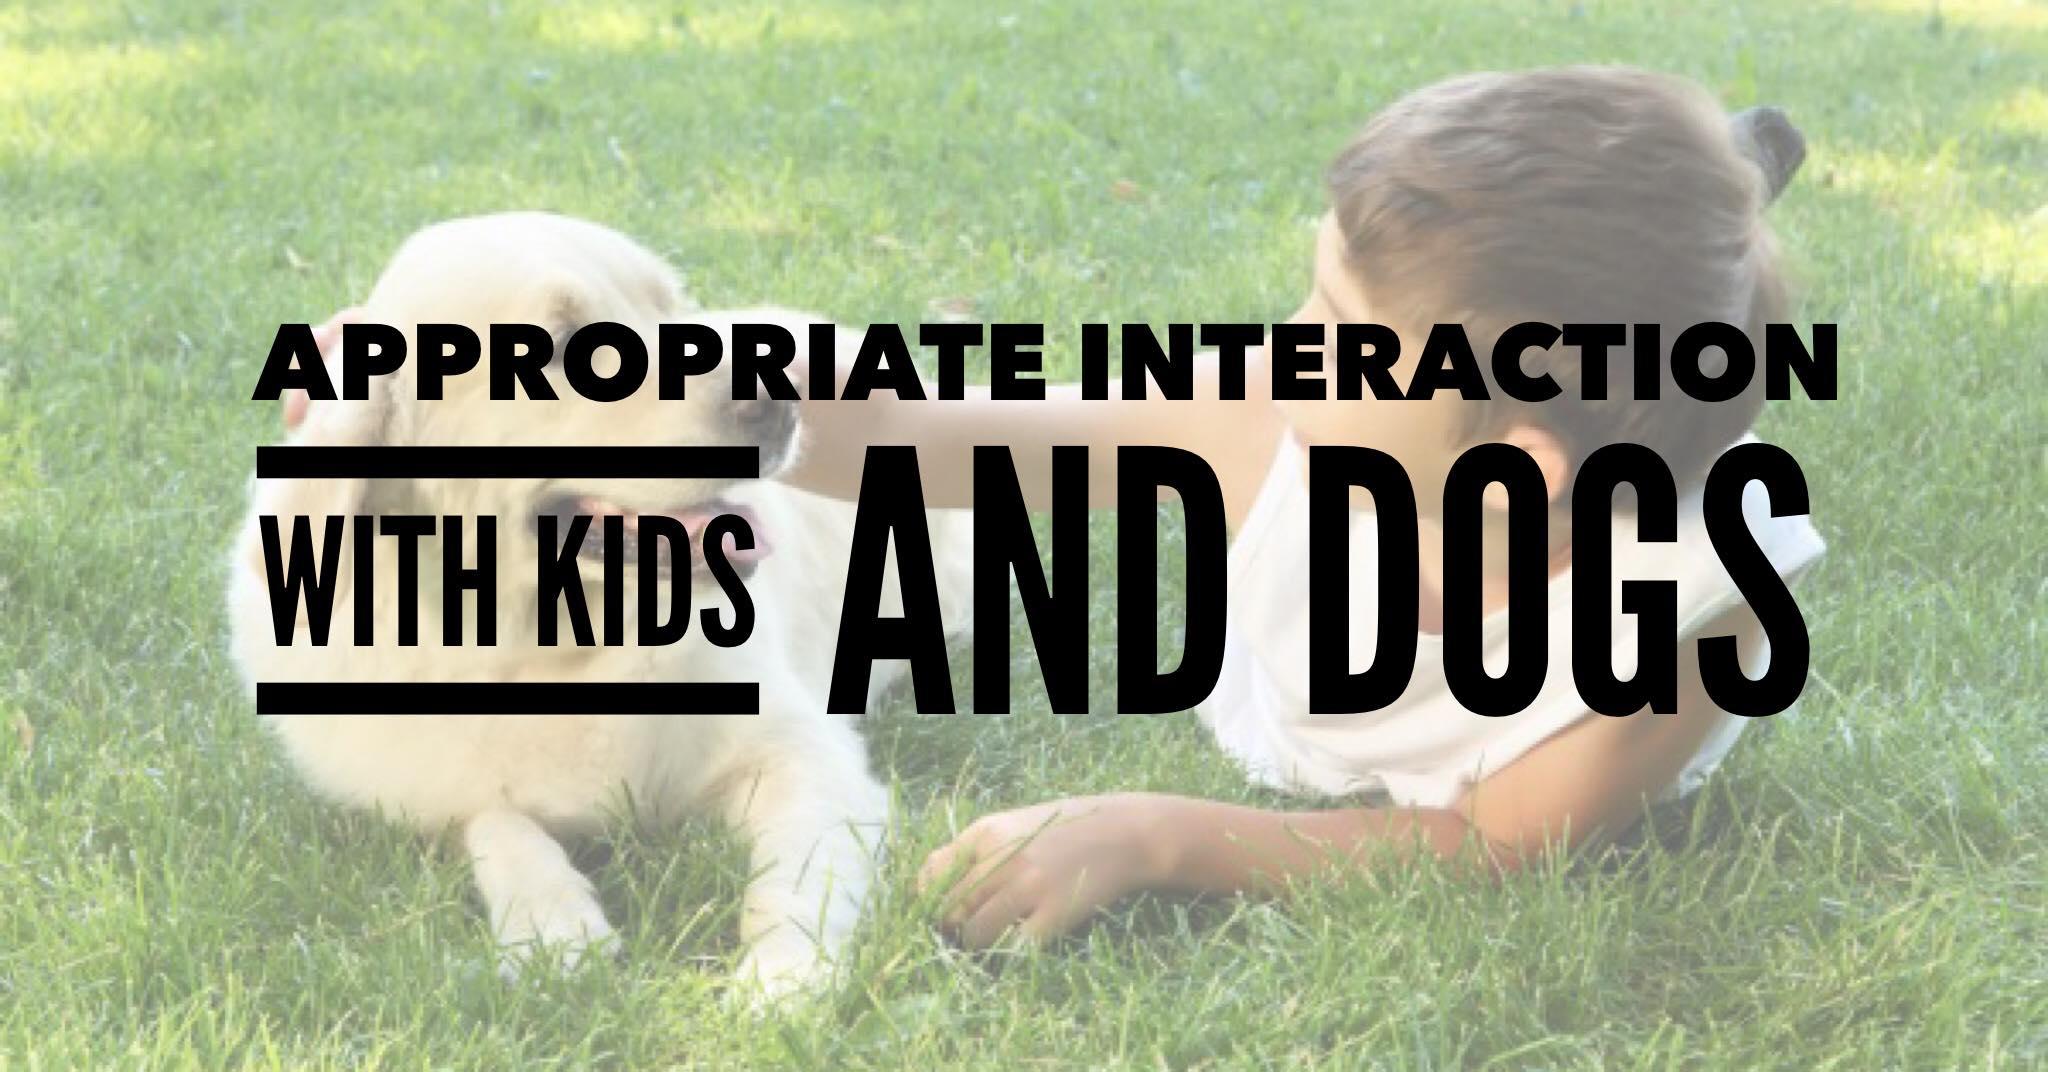 Kids & Dogs!